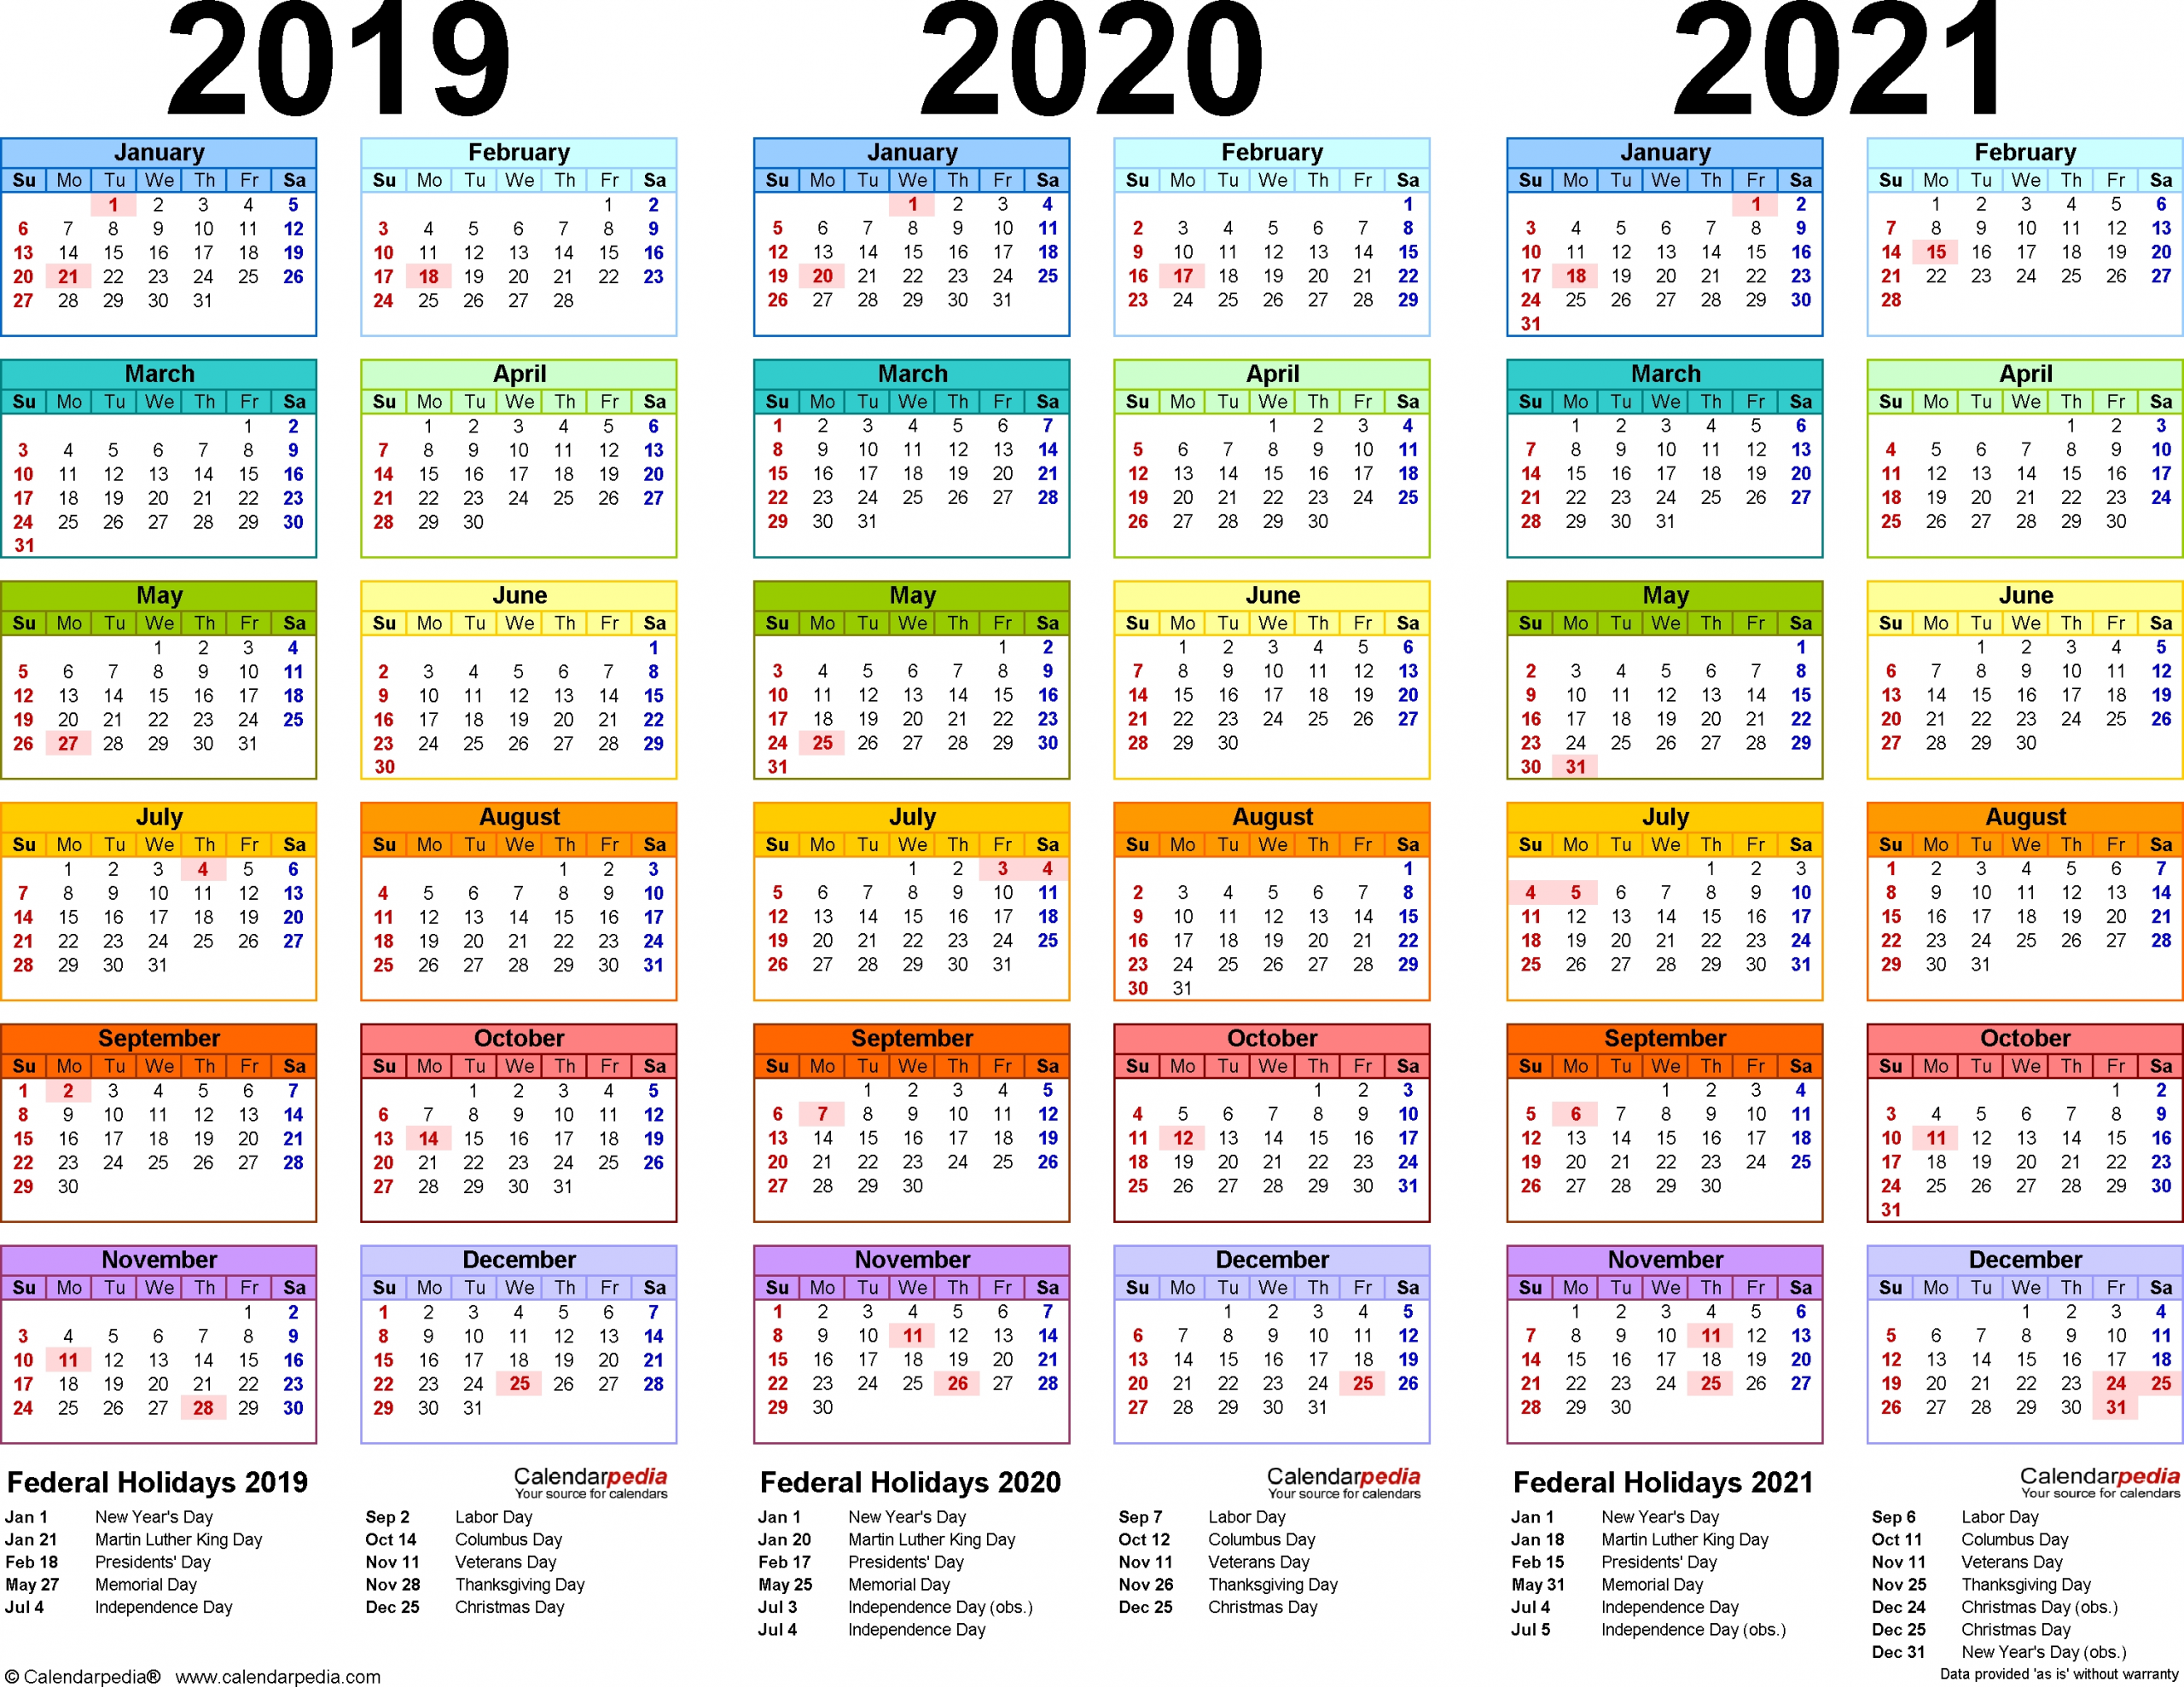 Payroll Calendar Printable For 2020 - Part 3